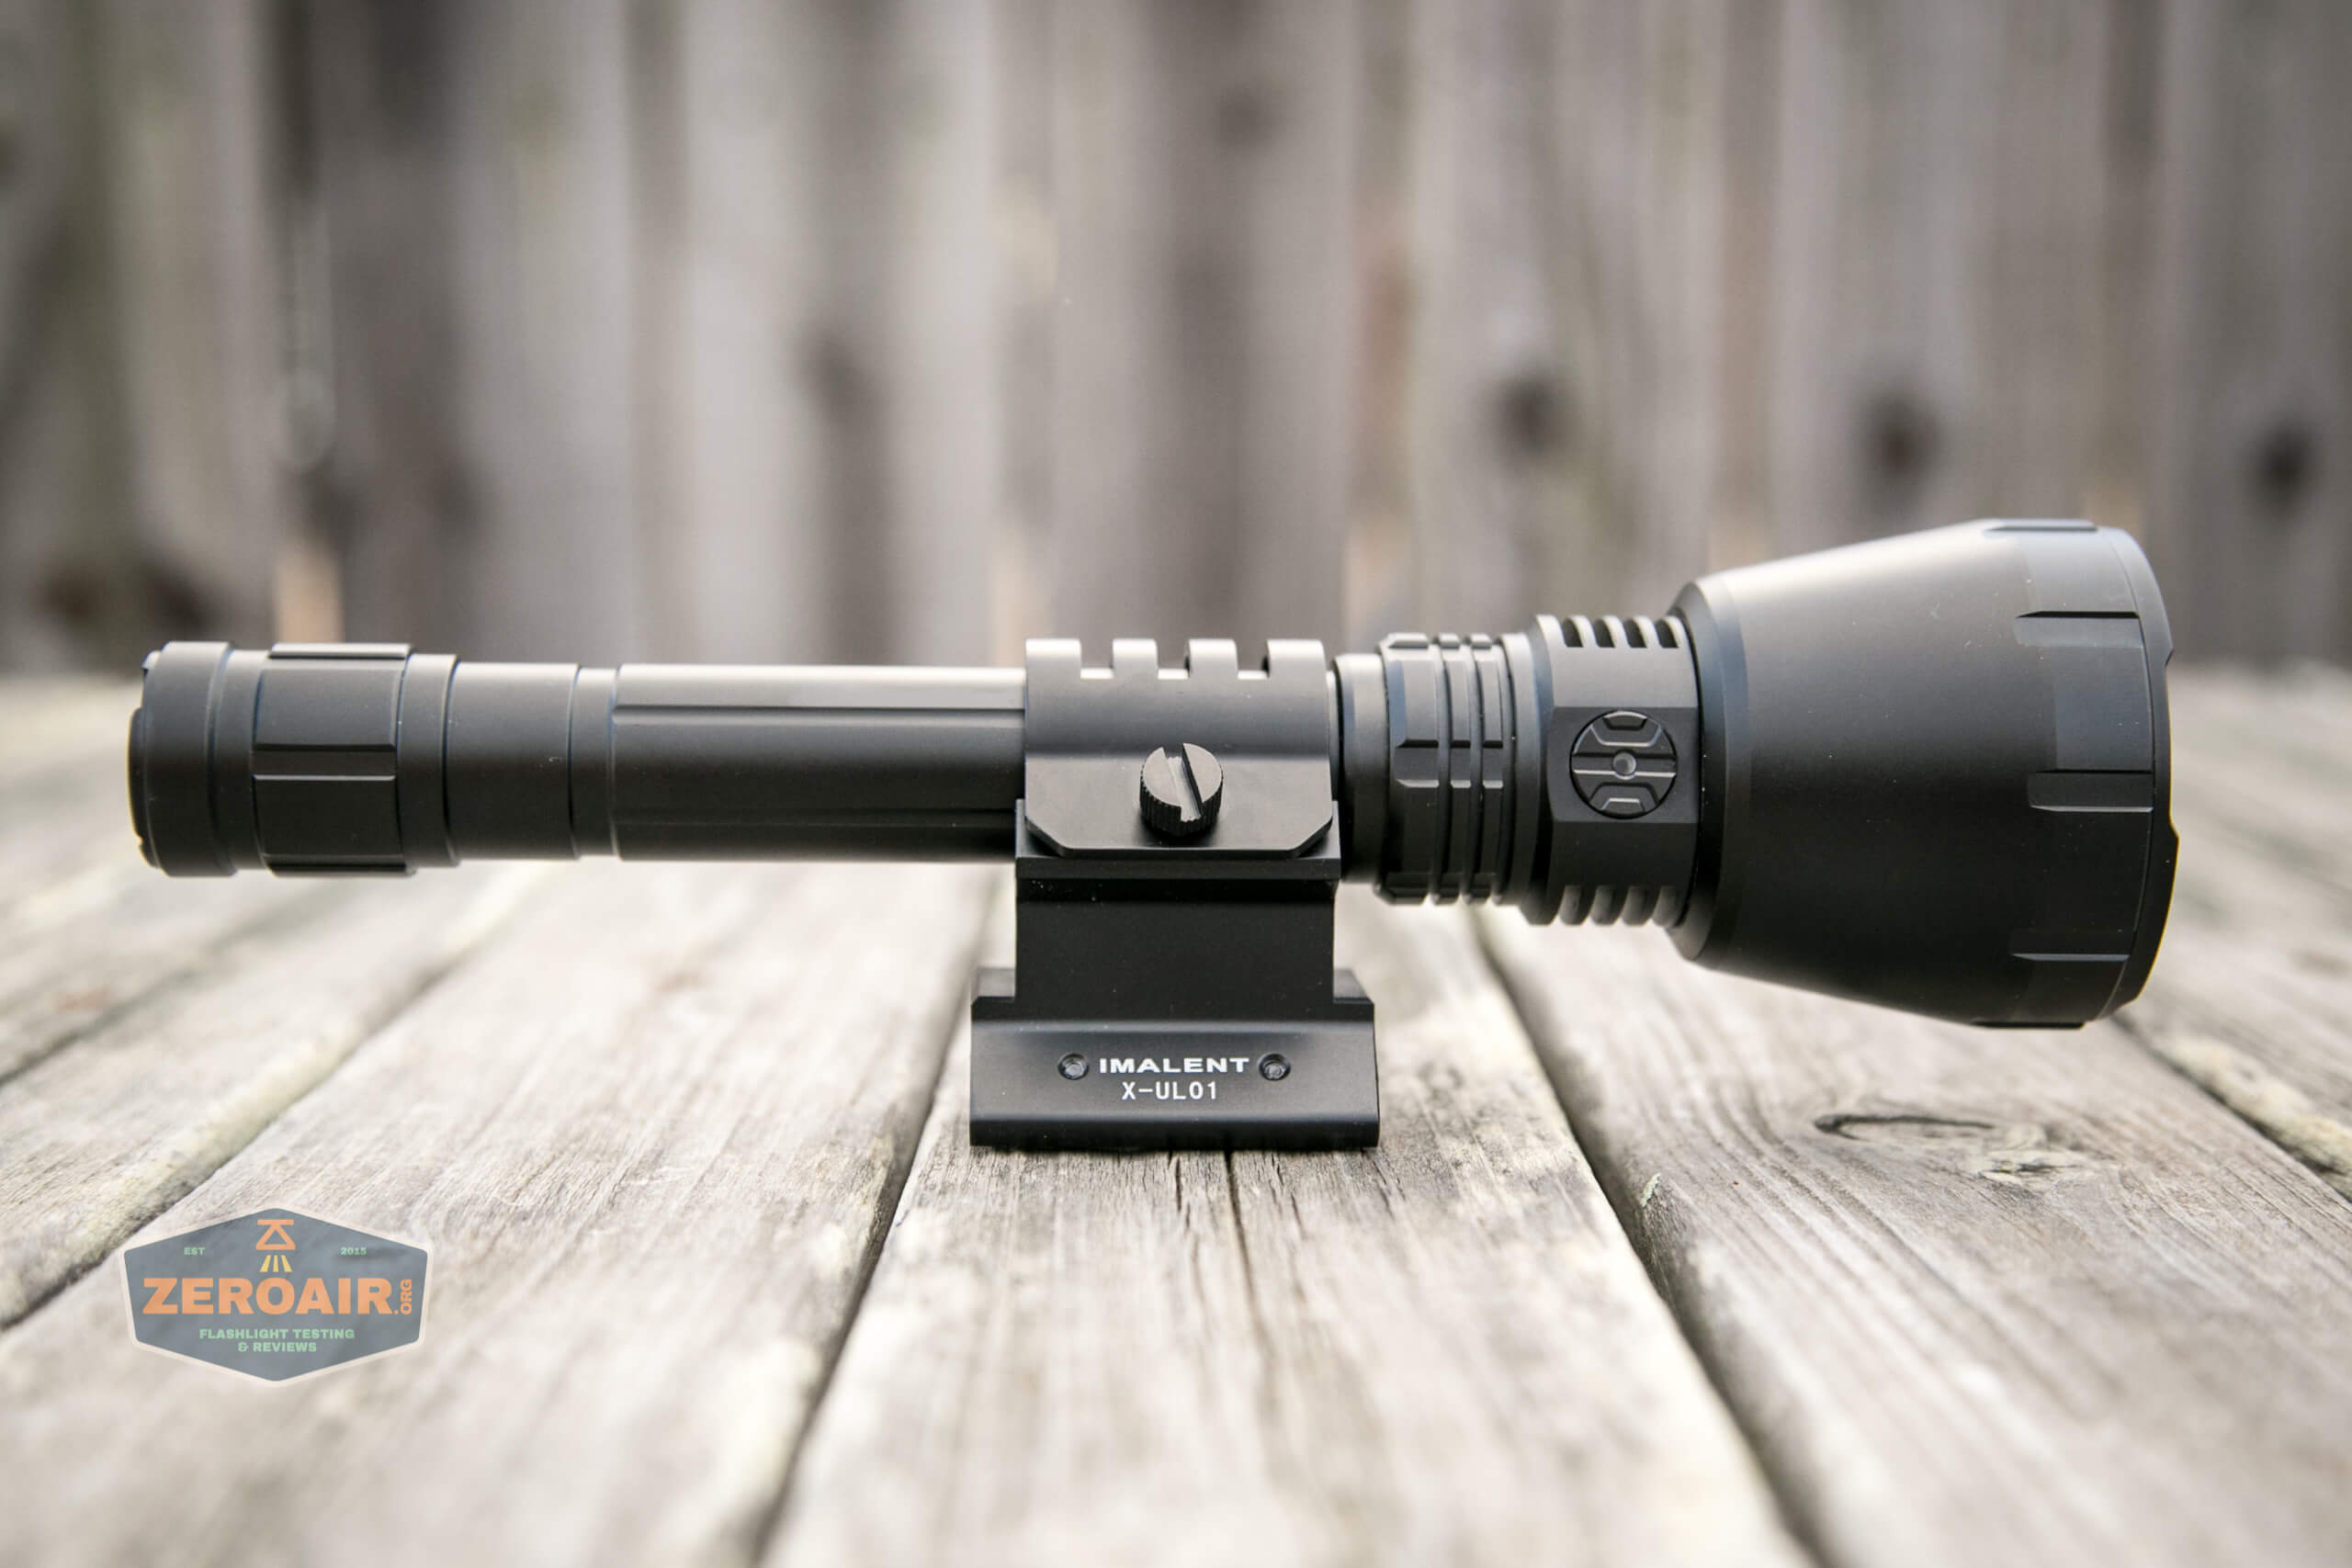 imalent ut90 weapon mount